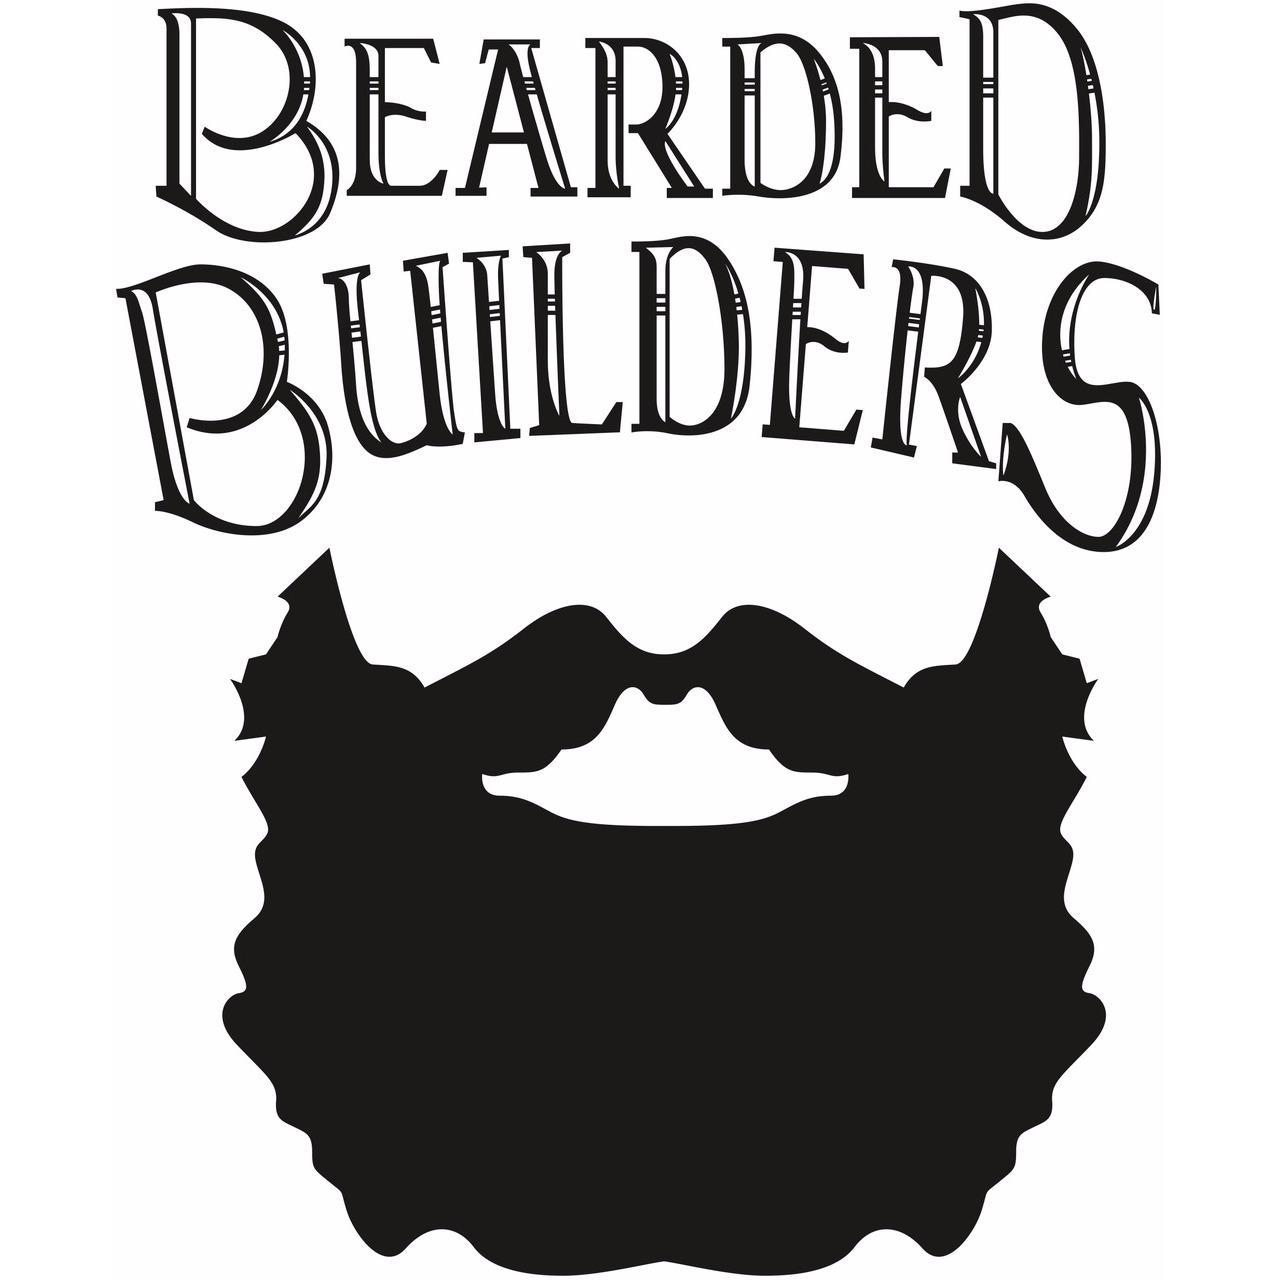 Bearded Builders Baltimore